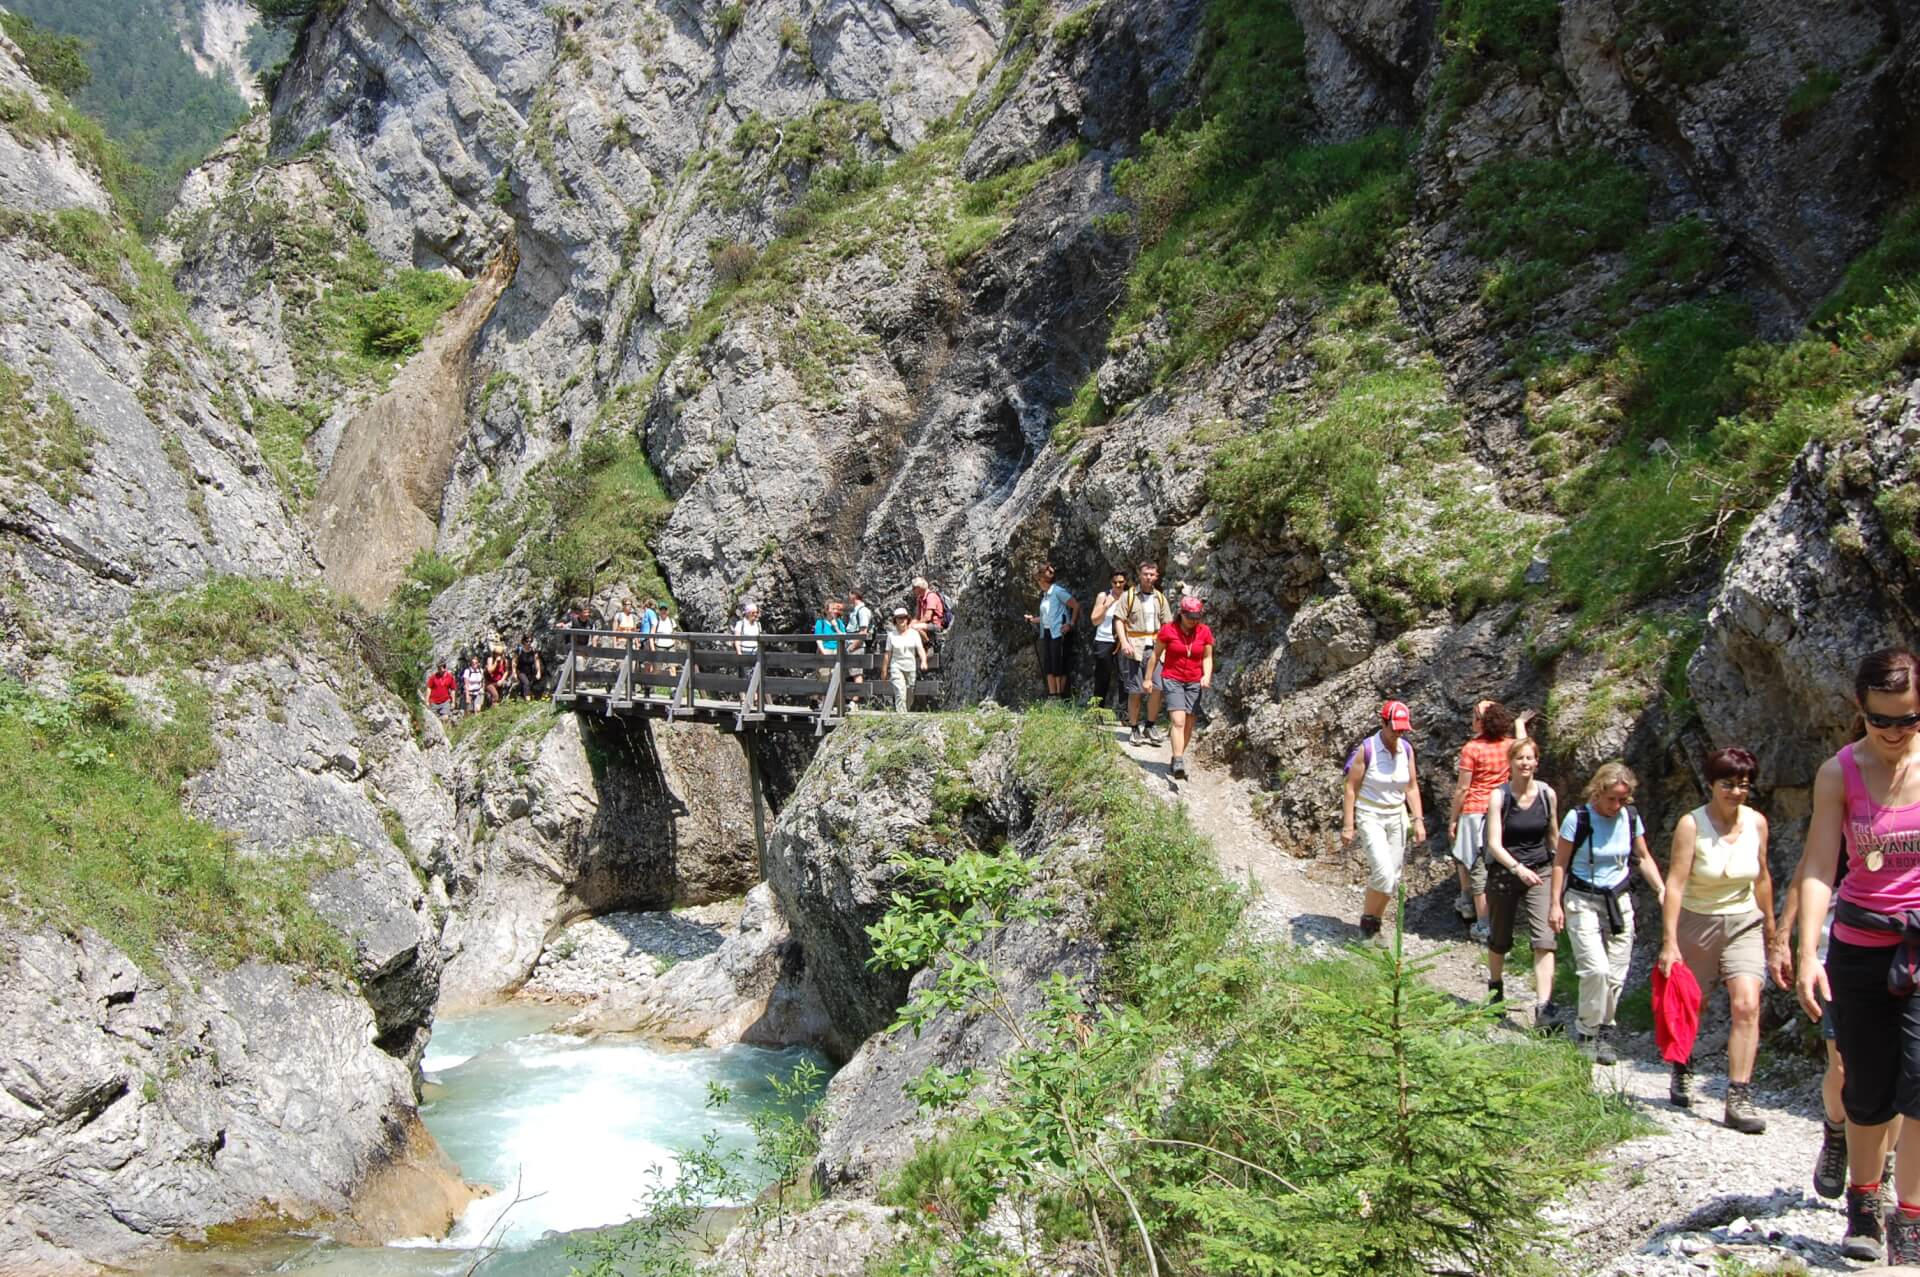 Lehrer bei Fortbildung im Naturpark Karwendel